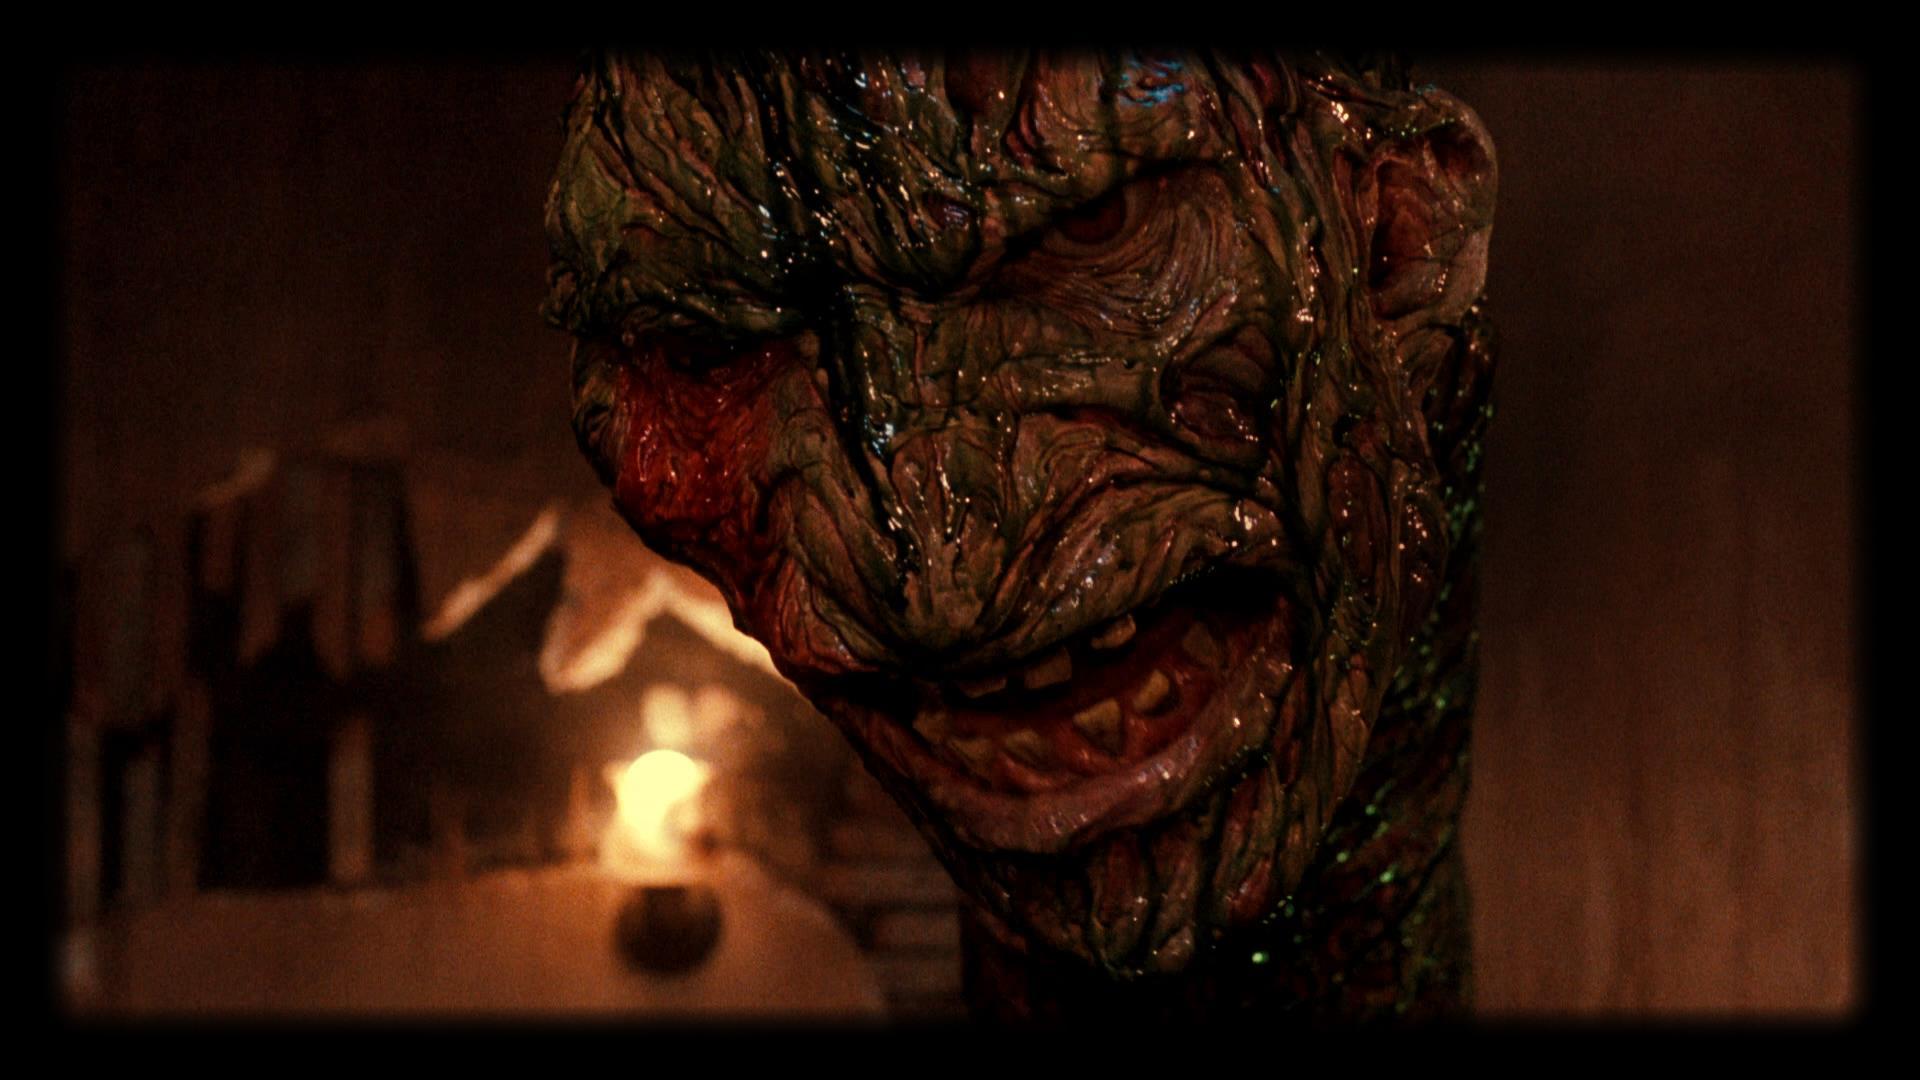 A-Nightmare-on-Elm-Street-3-Dream-Warriors.jpg